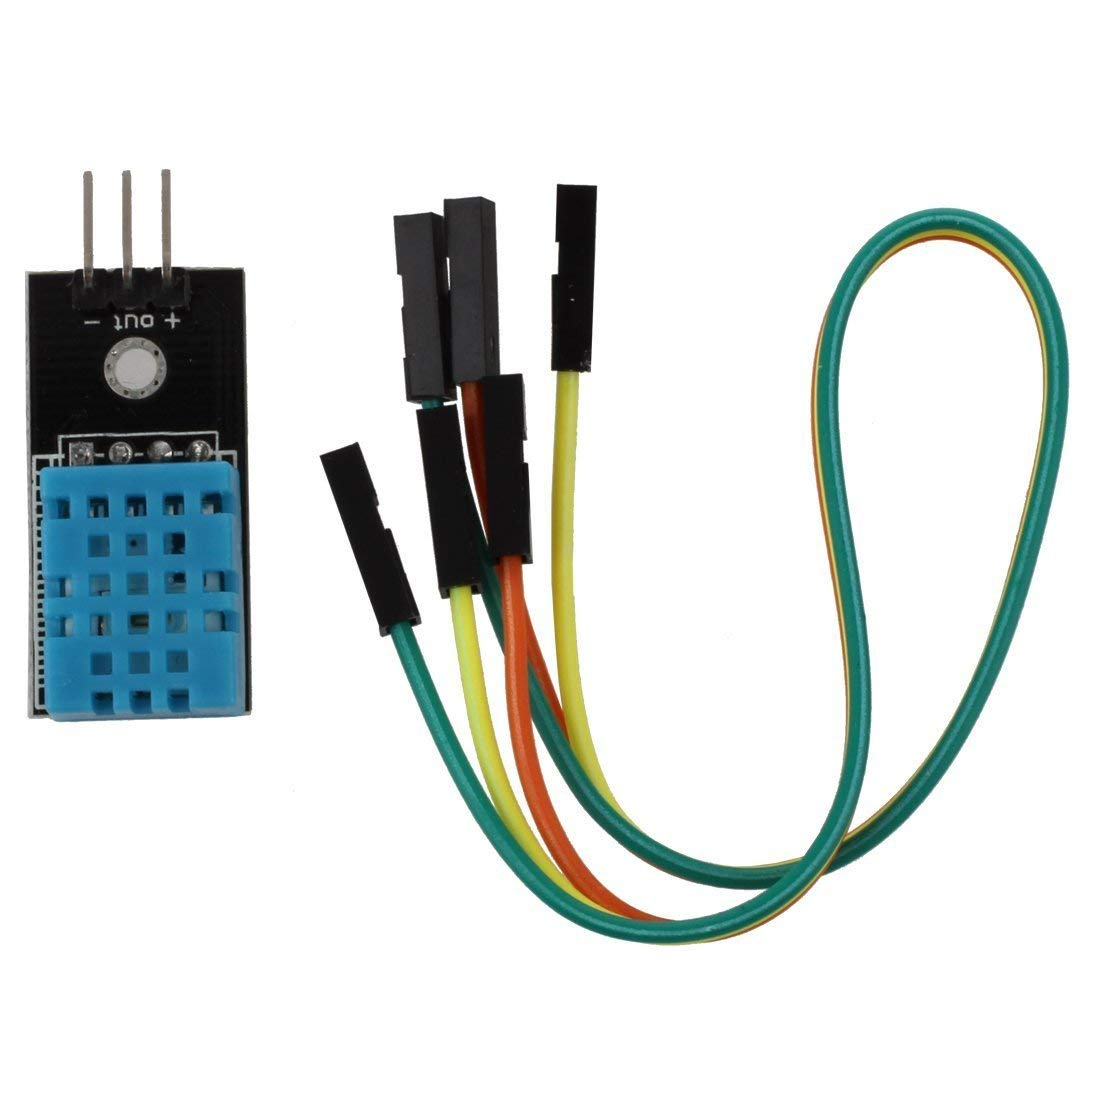 DHT11/DHT22 Digital Temperature Humidity Sensor Module For Arduino Compatible SCM & DIY Kits Compatible SCM Components Pakistan